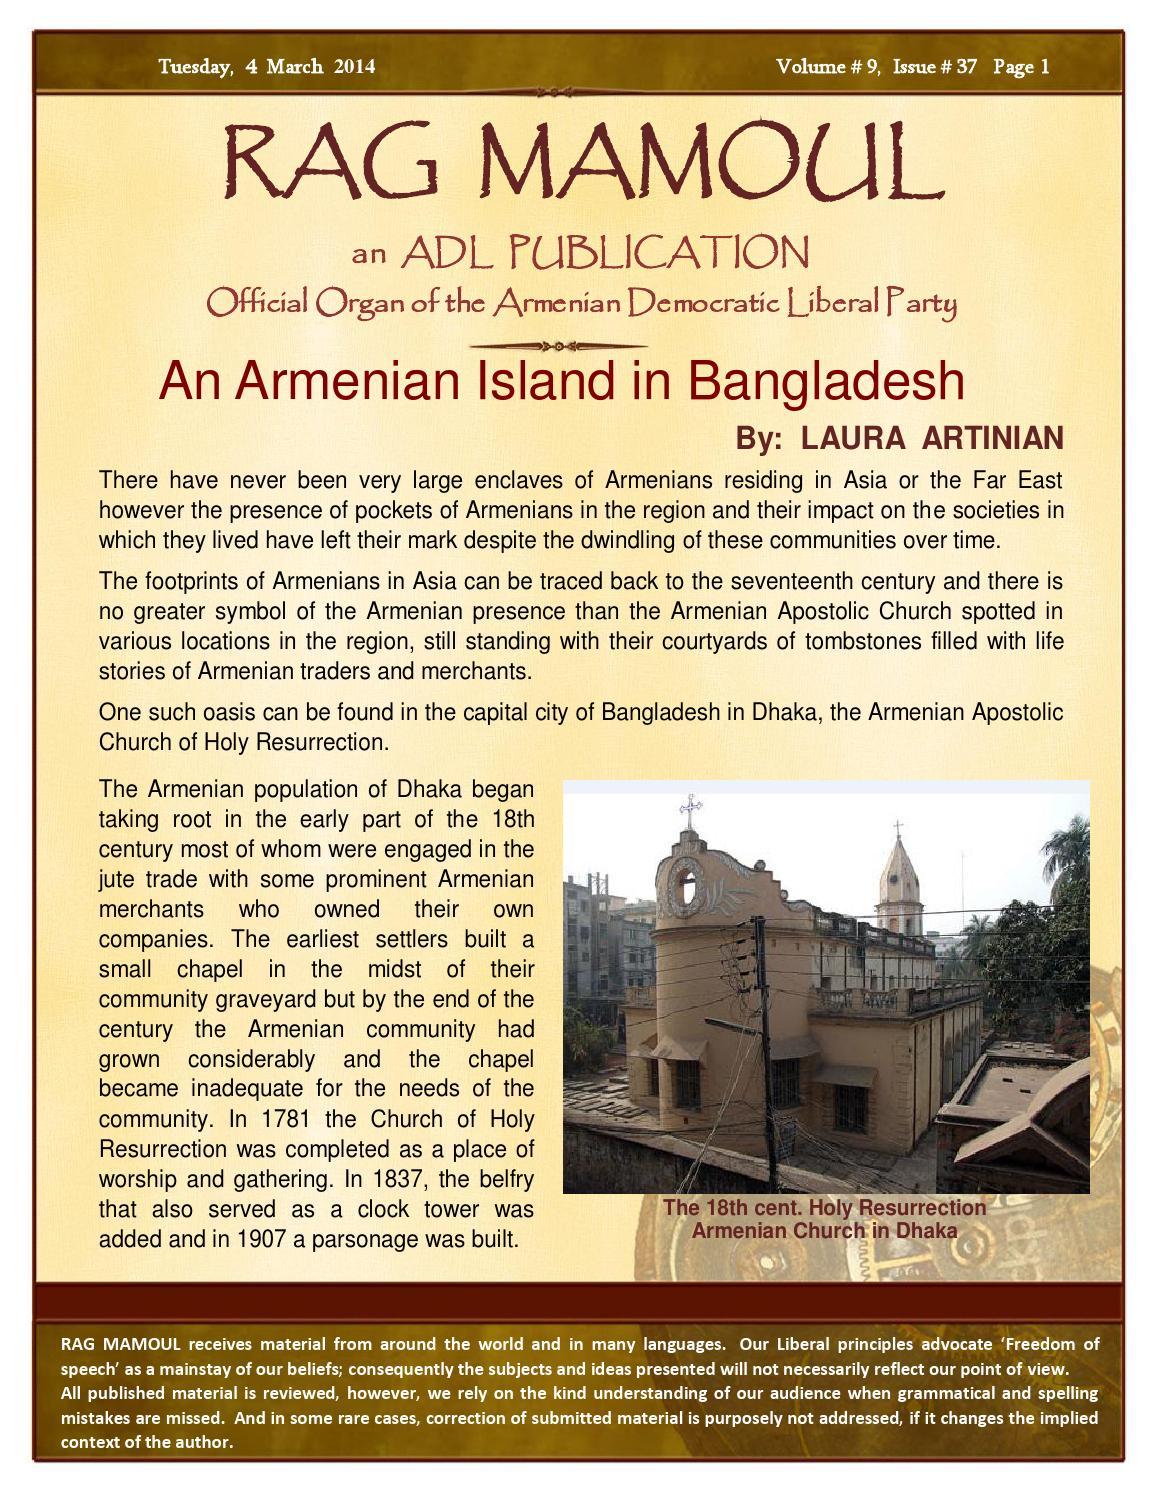 An armenian island in bangladesh by laura artinian by